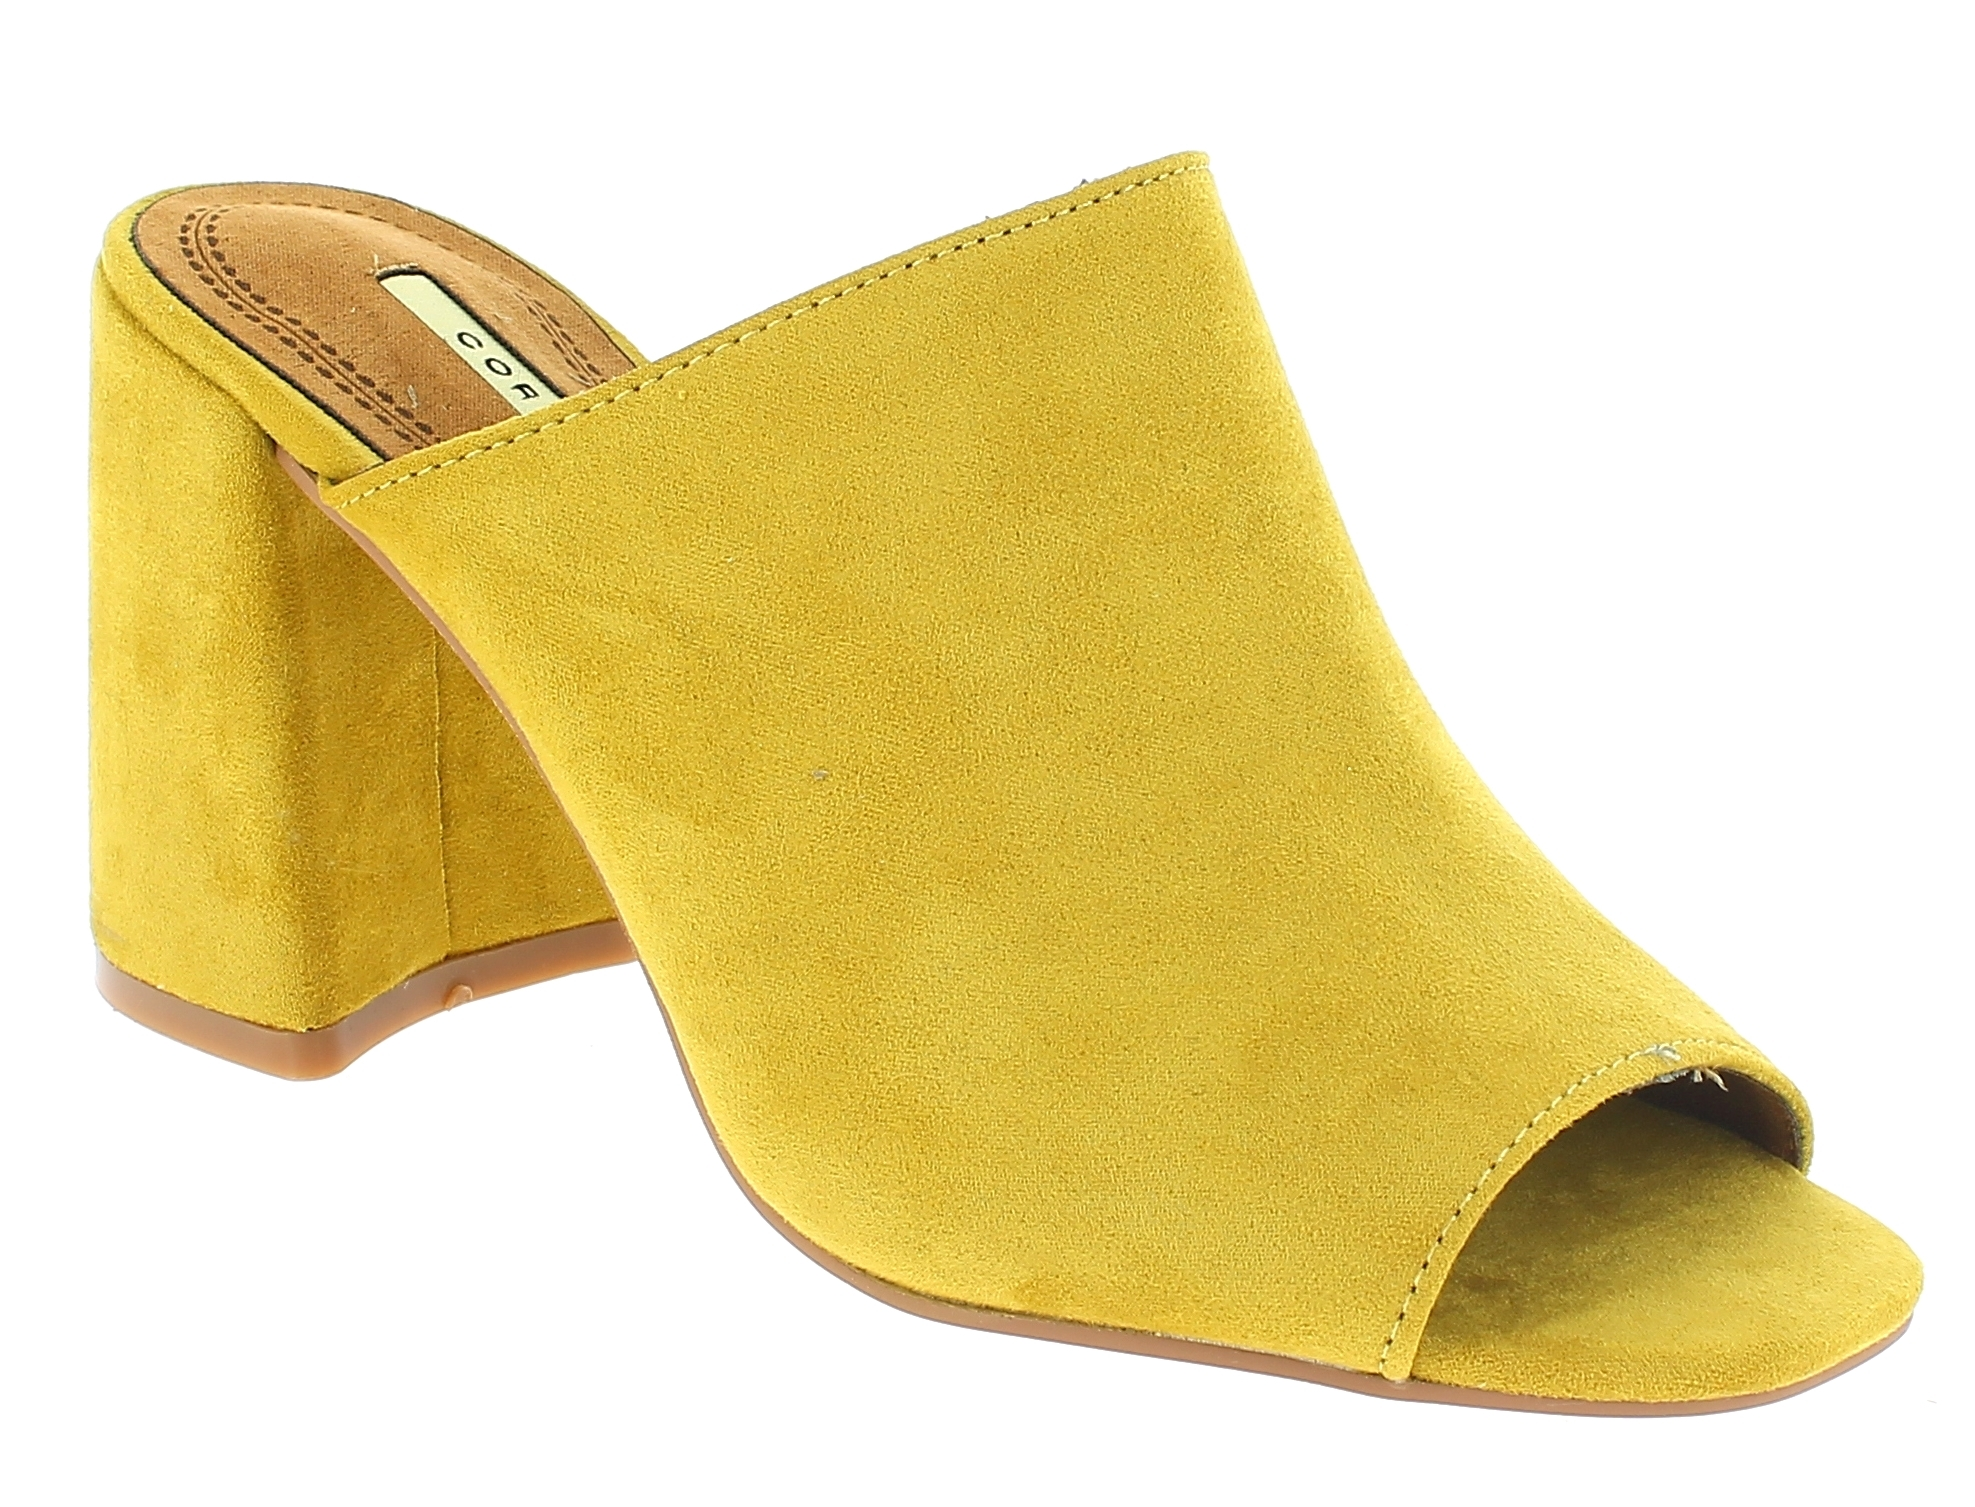 CORINA Γυναικείο Πέδιλο C8190 Κίτρινο - yellow - C8190  MOSTAZA-CORINA-yellow-37 bf91bb5b654